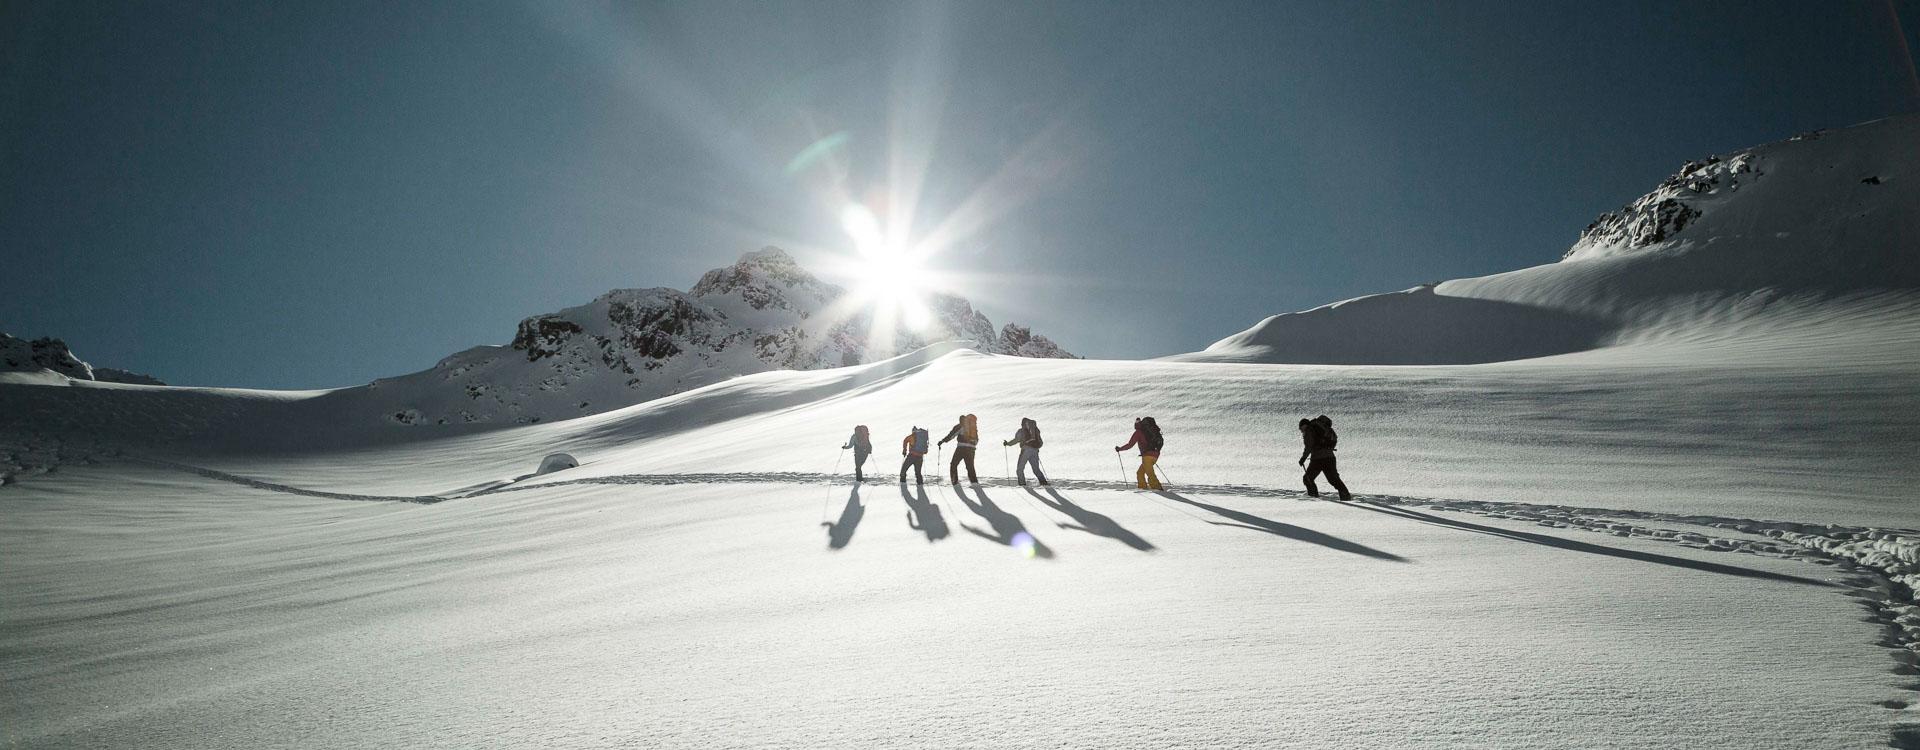 Skitouren Kurse in der Silvretta am Piz Buin